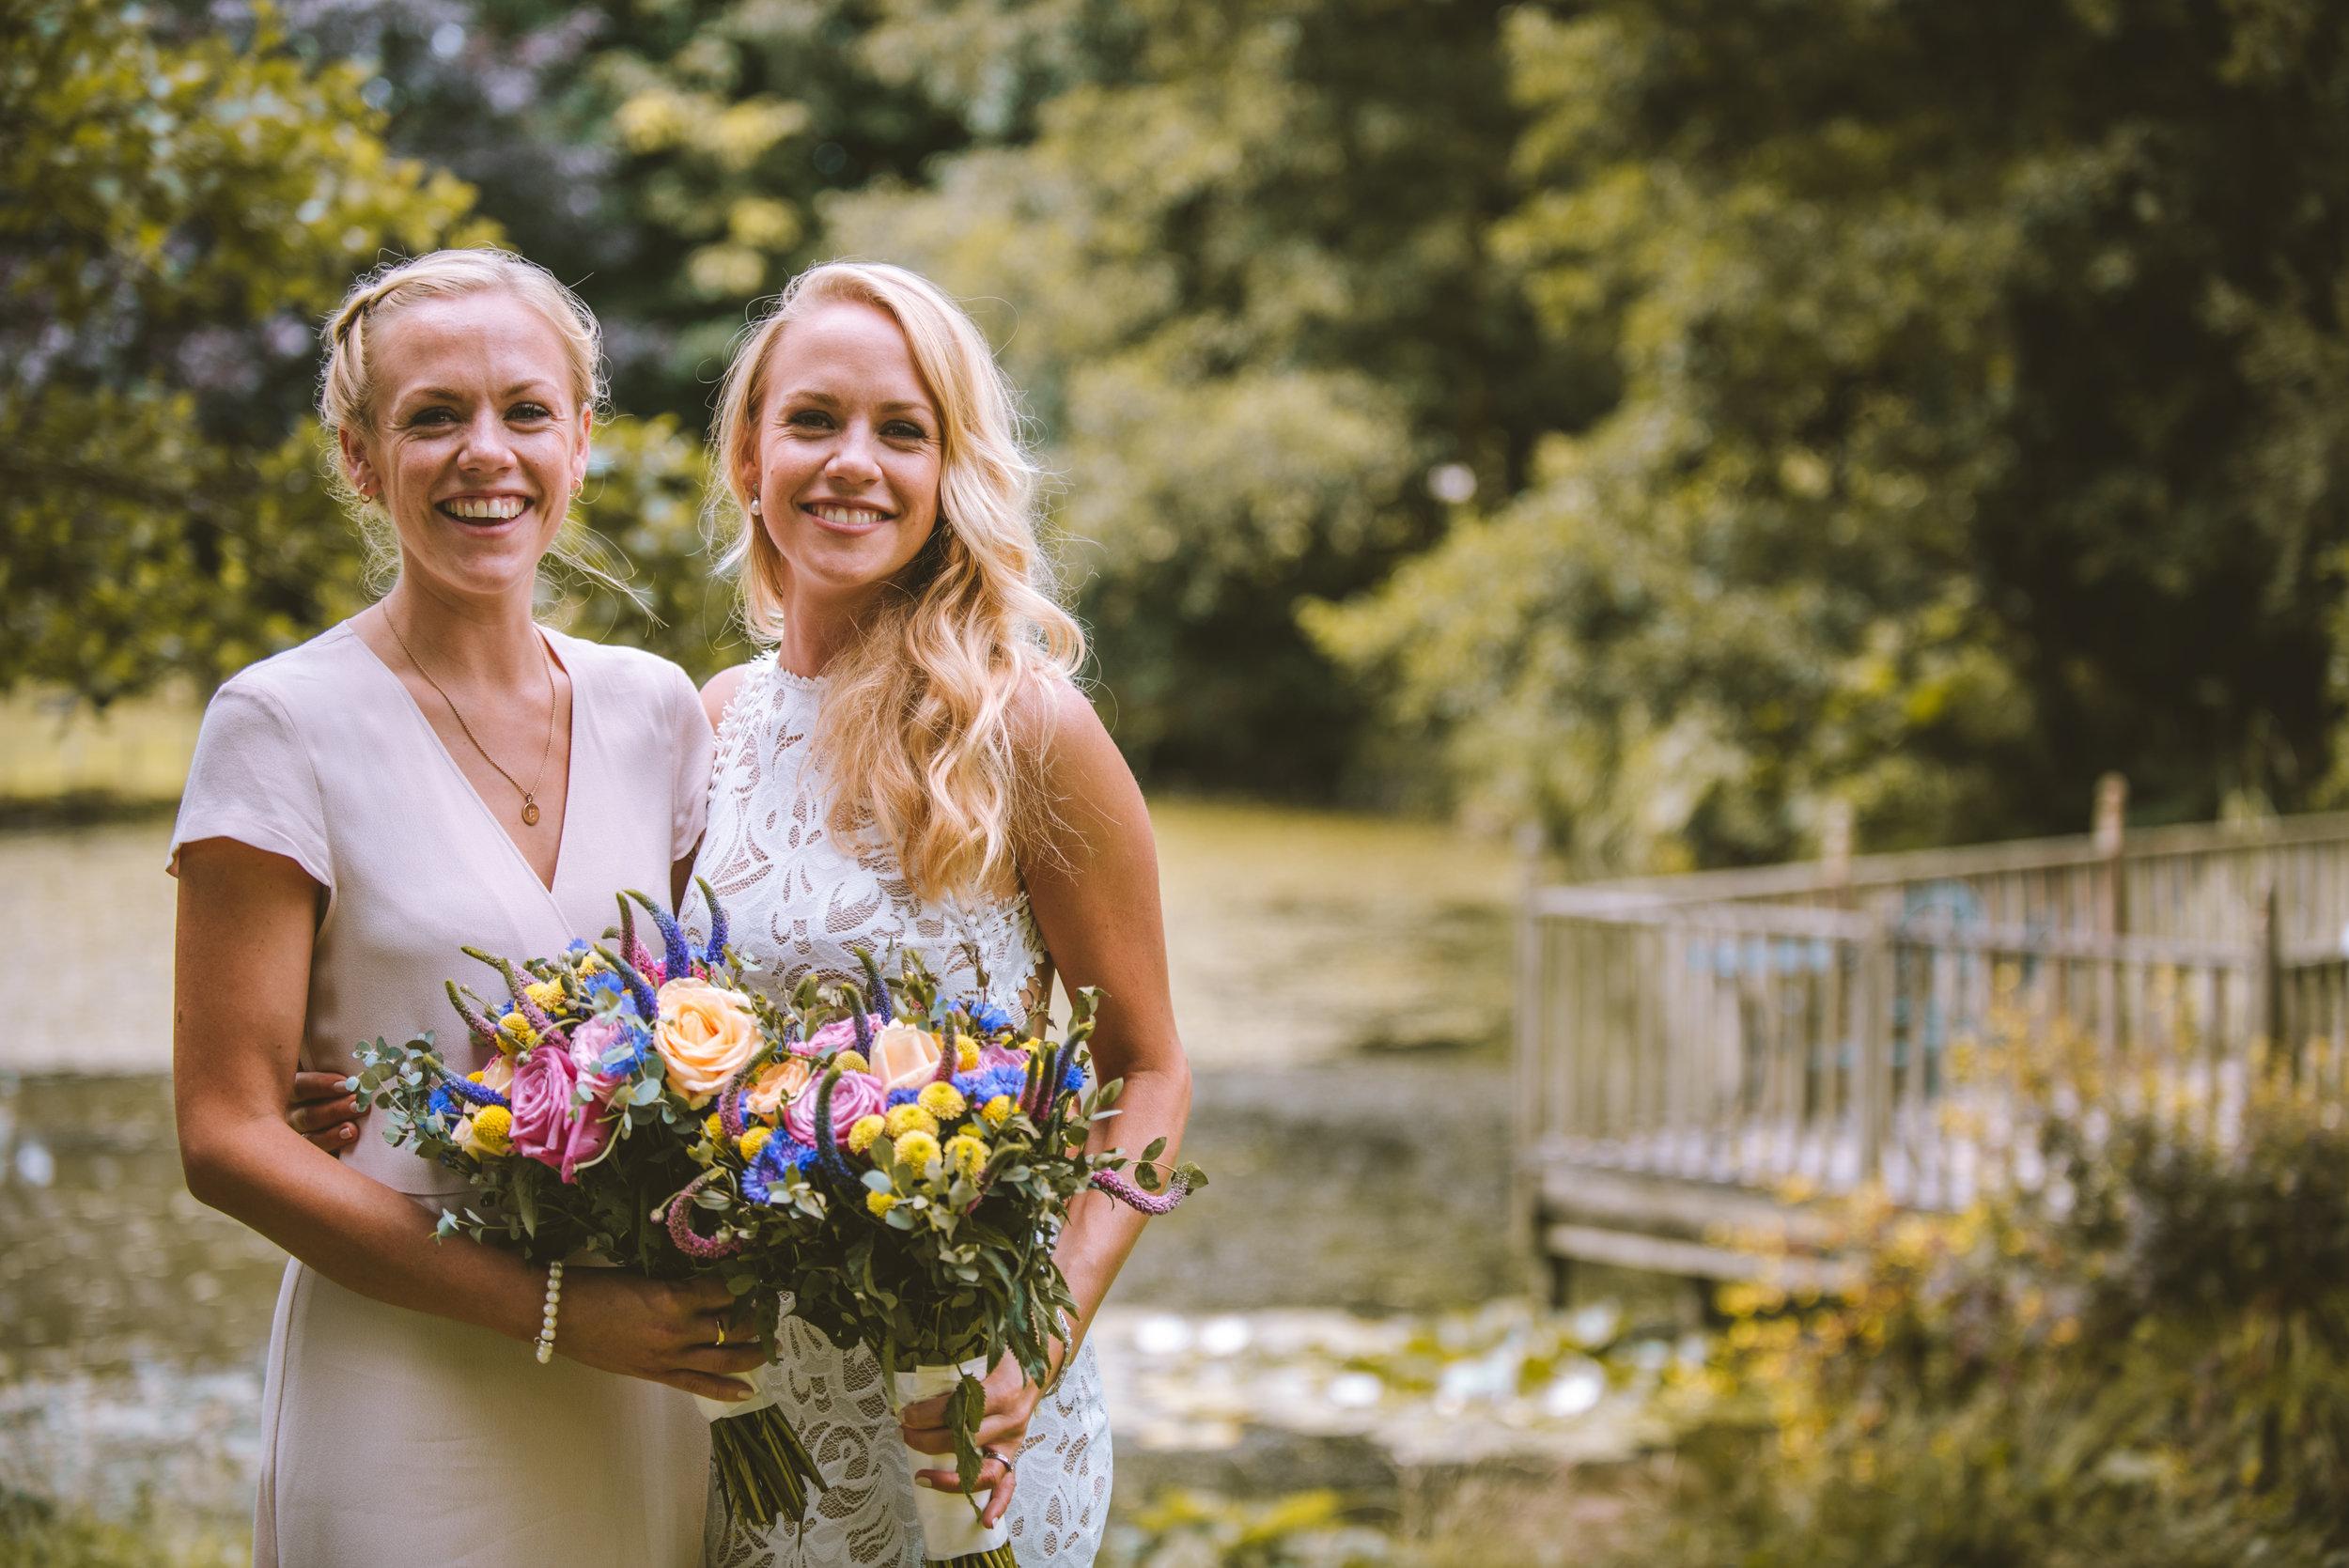 deers-leap-wedding-photographer-51.jpg